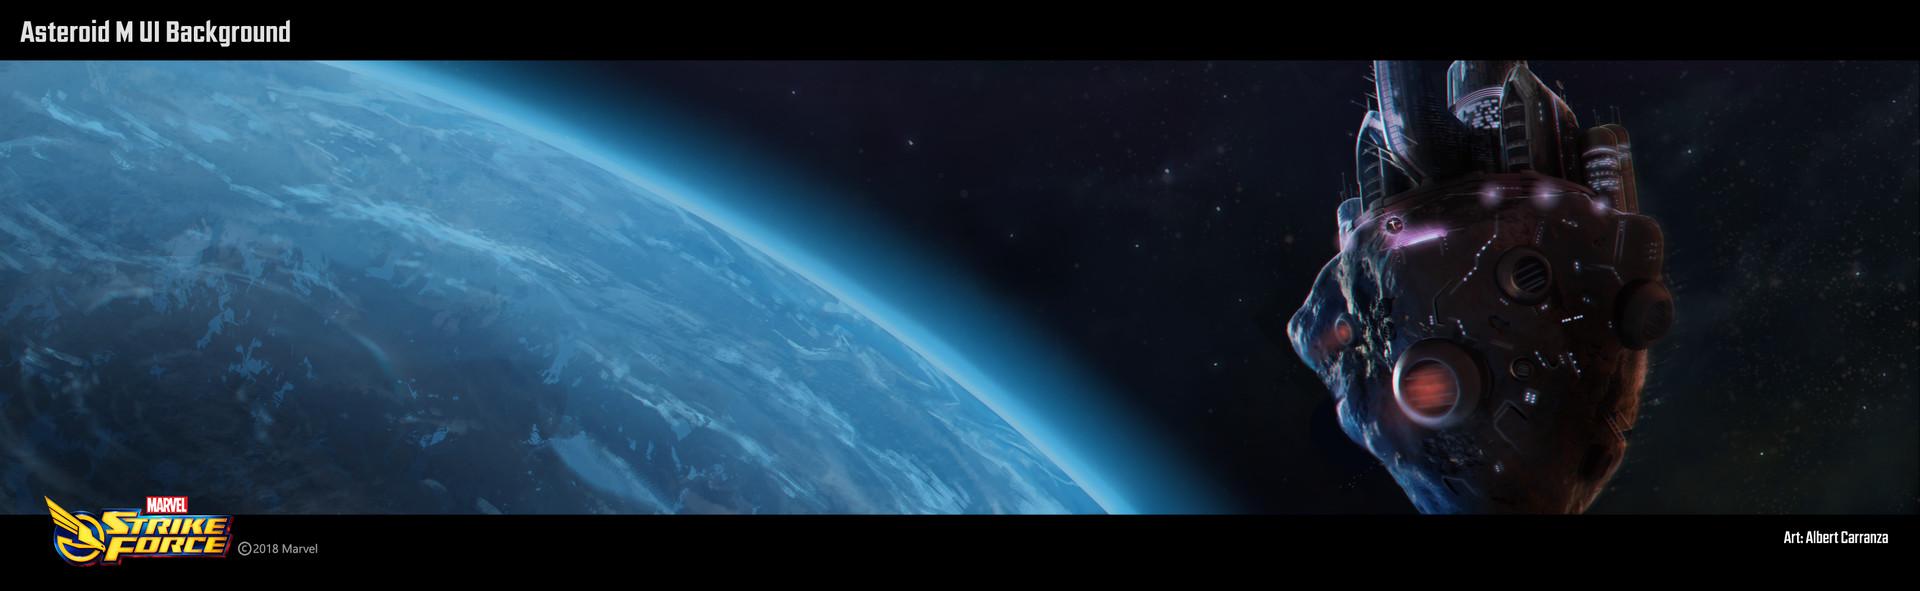 Albert carranza ui homebackground asteroidm exp2 1mockup